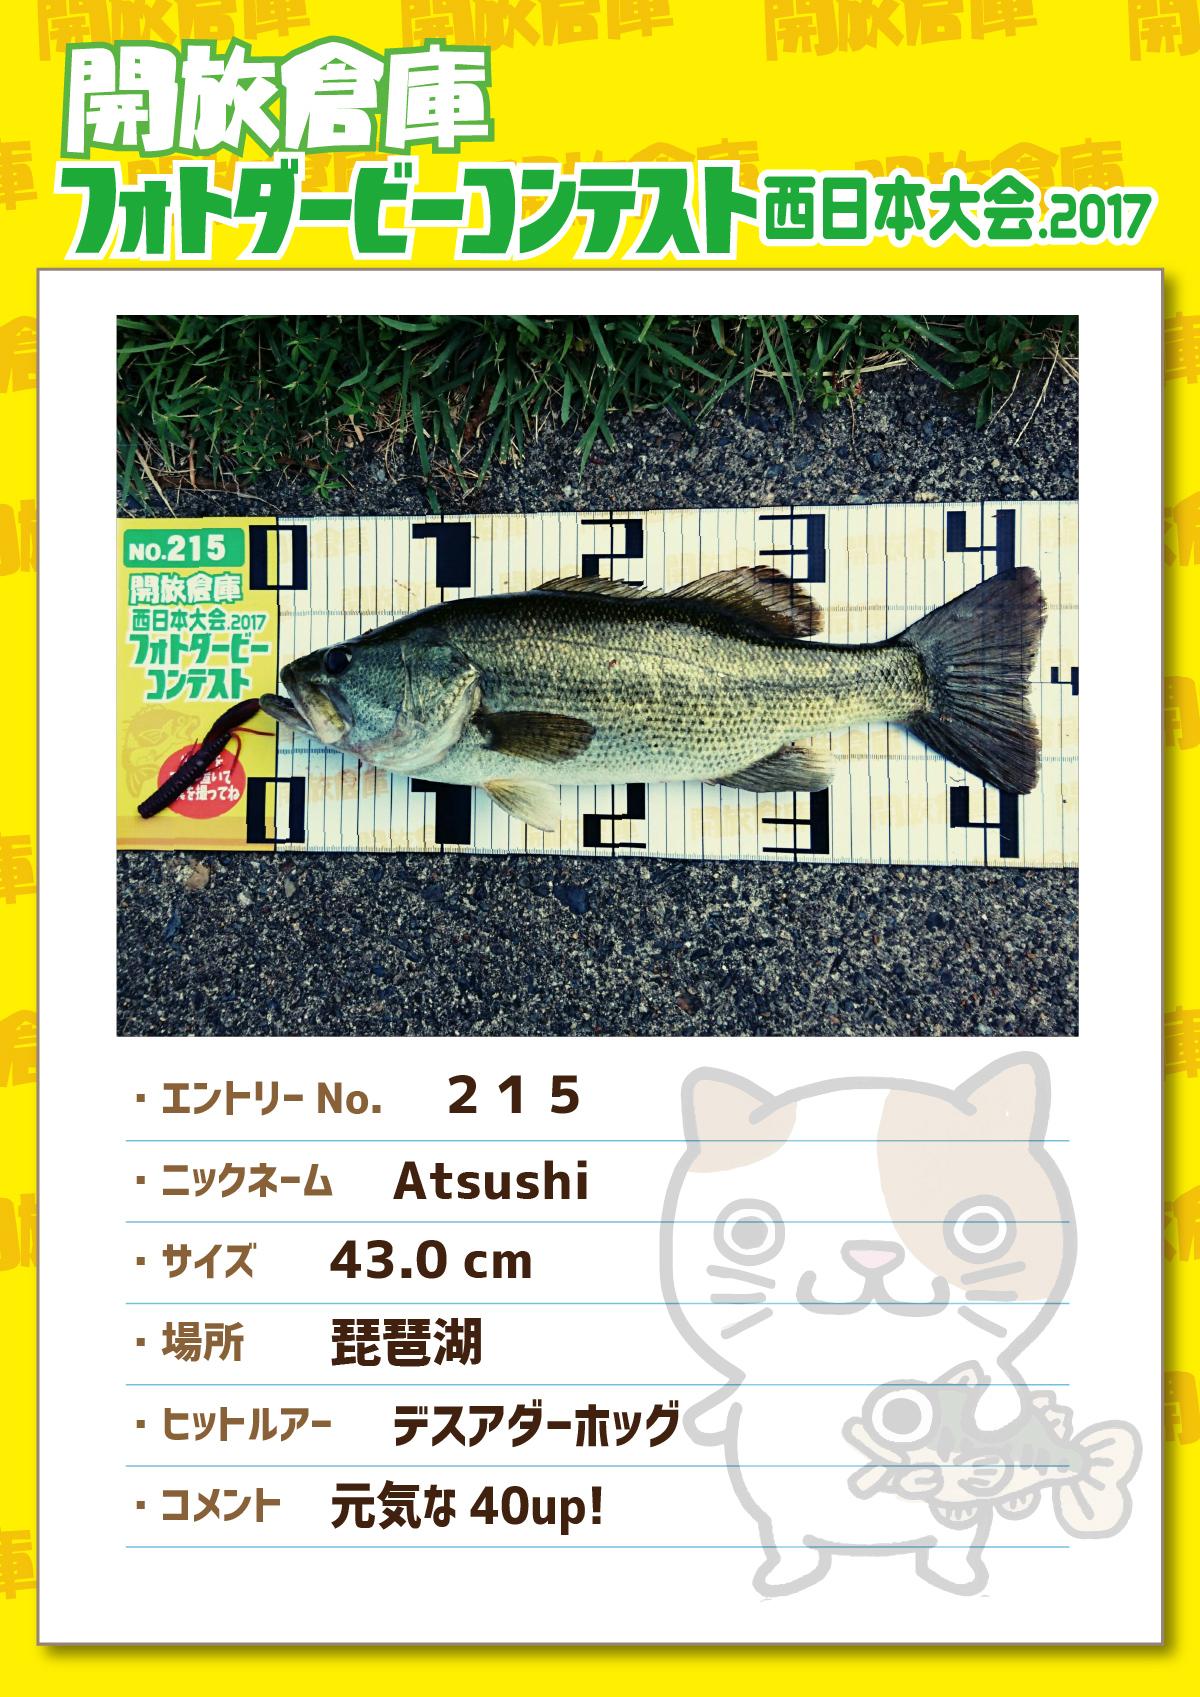 No.215 Atsushi 43.0cm 琵琶湖 デスアダーホッグ 元気な40UP!